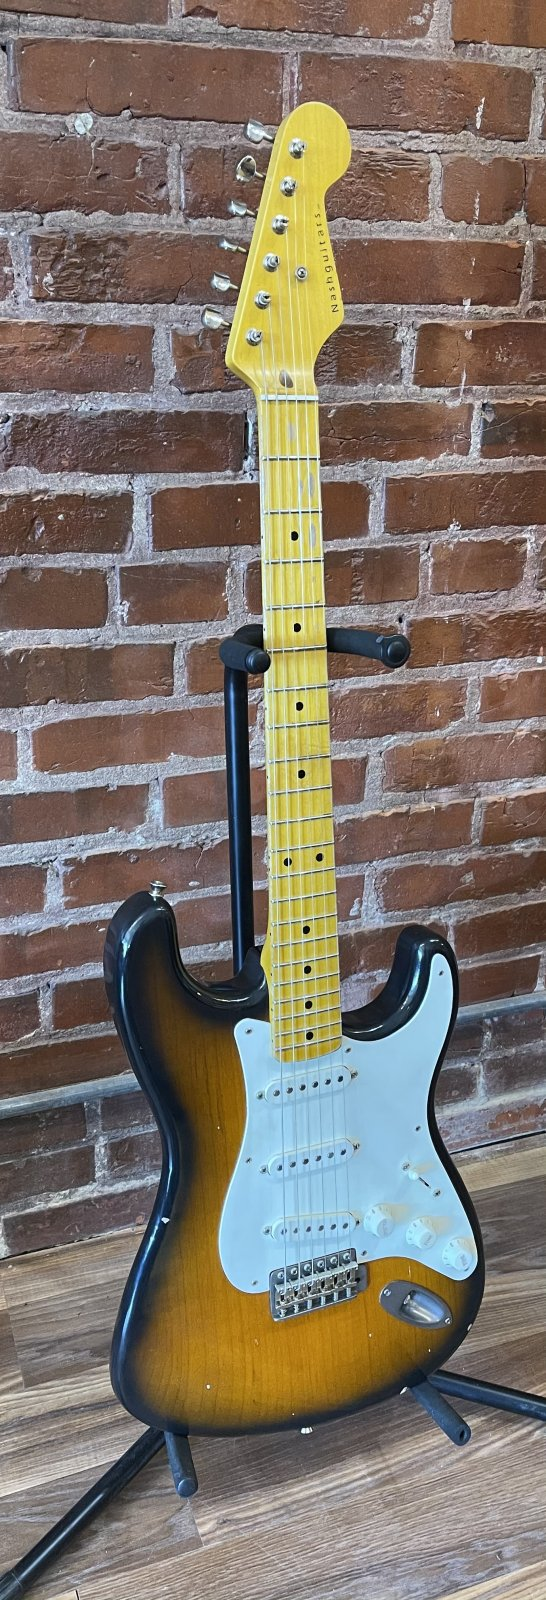 Nash Guitars S-57 Electric Guitar